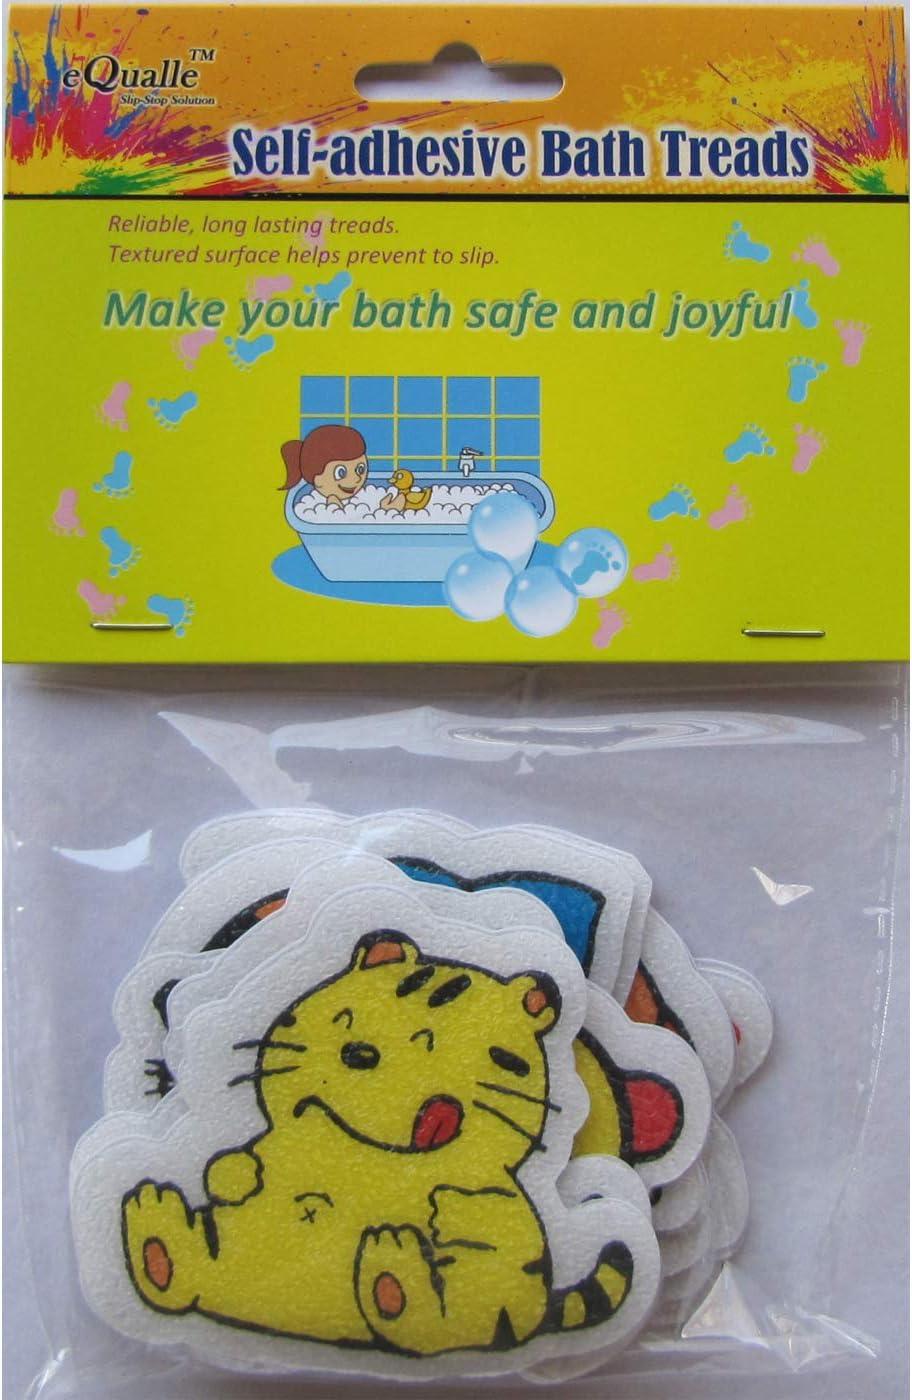 Pasnowfu Waterproof And Non Slip Bathtub Stickers Marine Organism Decal Treads Adhesive Bathroom Shower Safety Appliques For Baby Kids Bath Tub 20 Set Kids Bathtub Accessories Kids Home Store